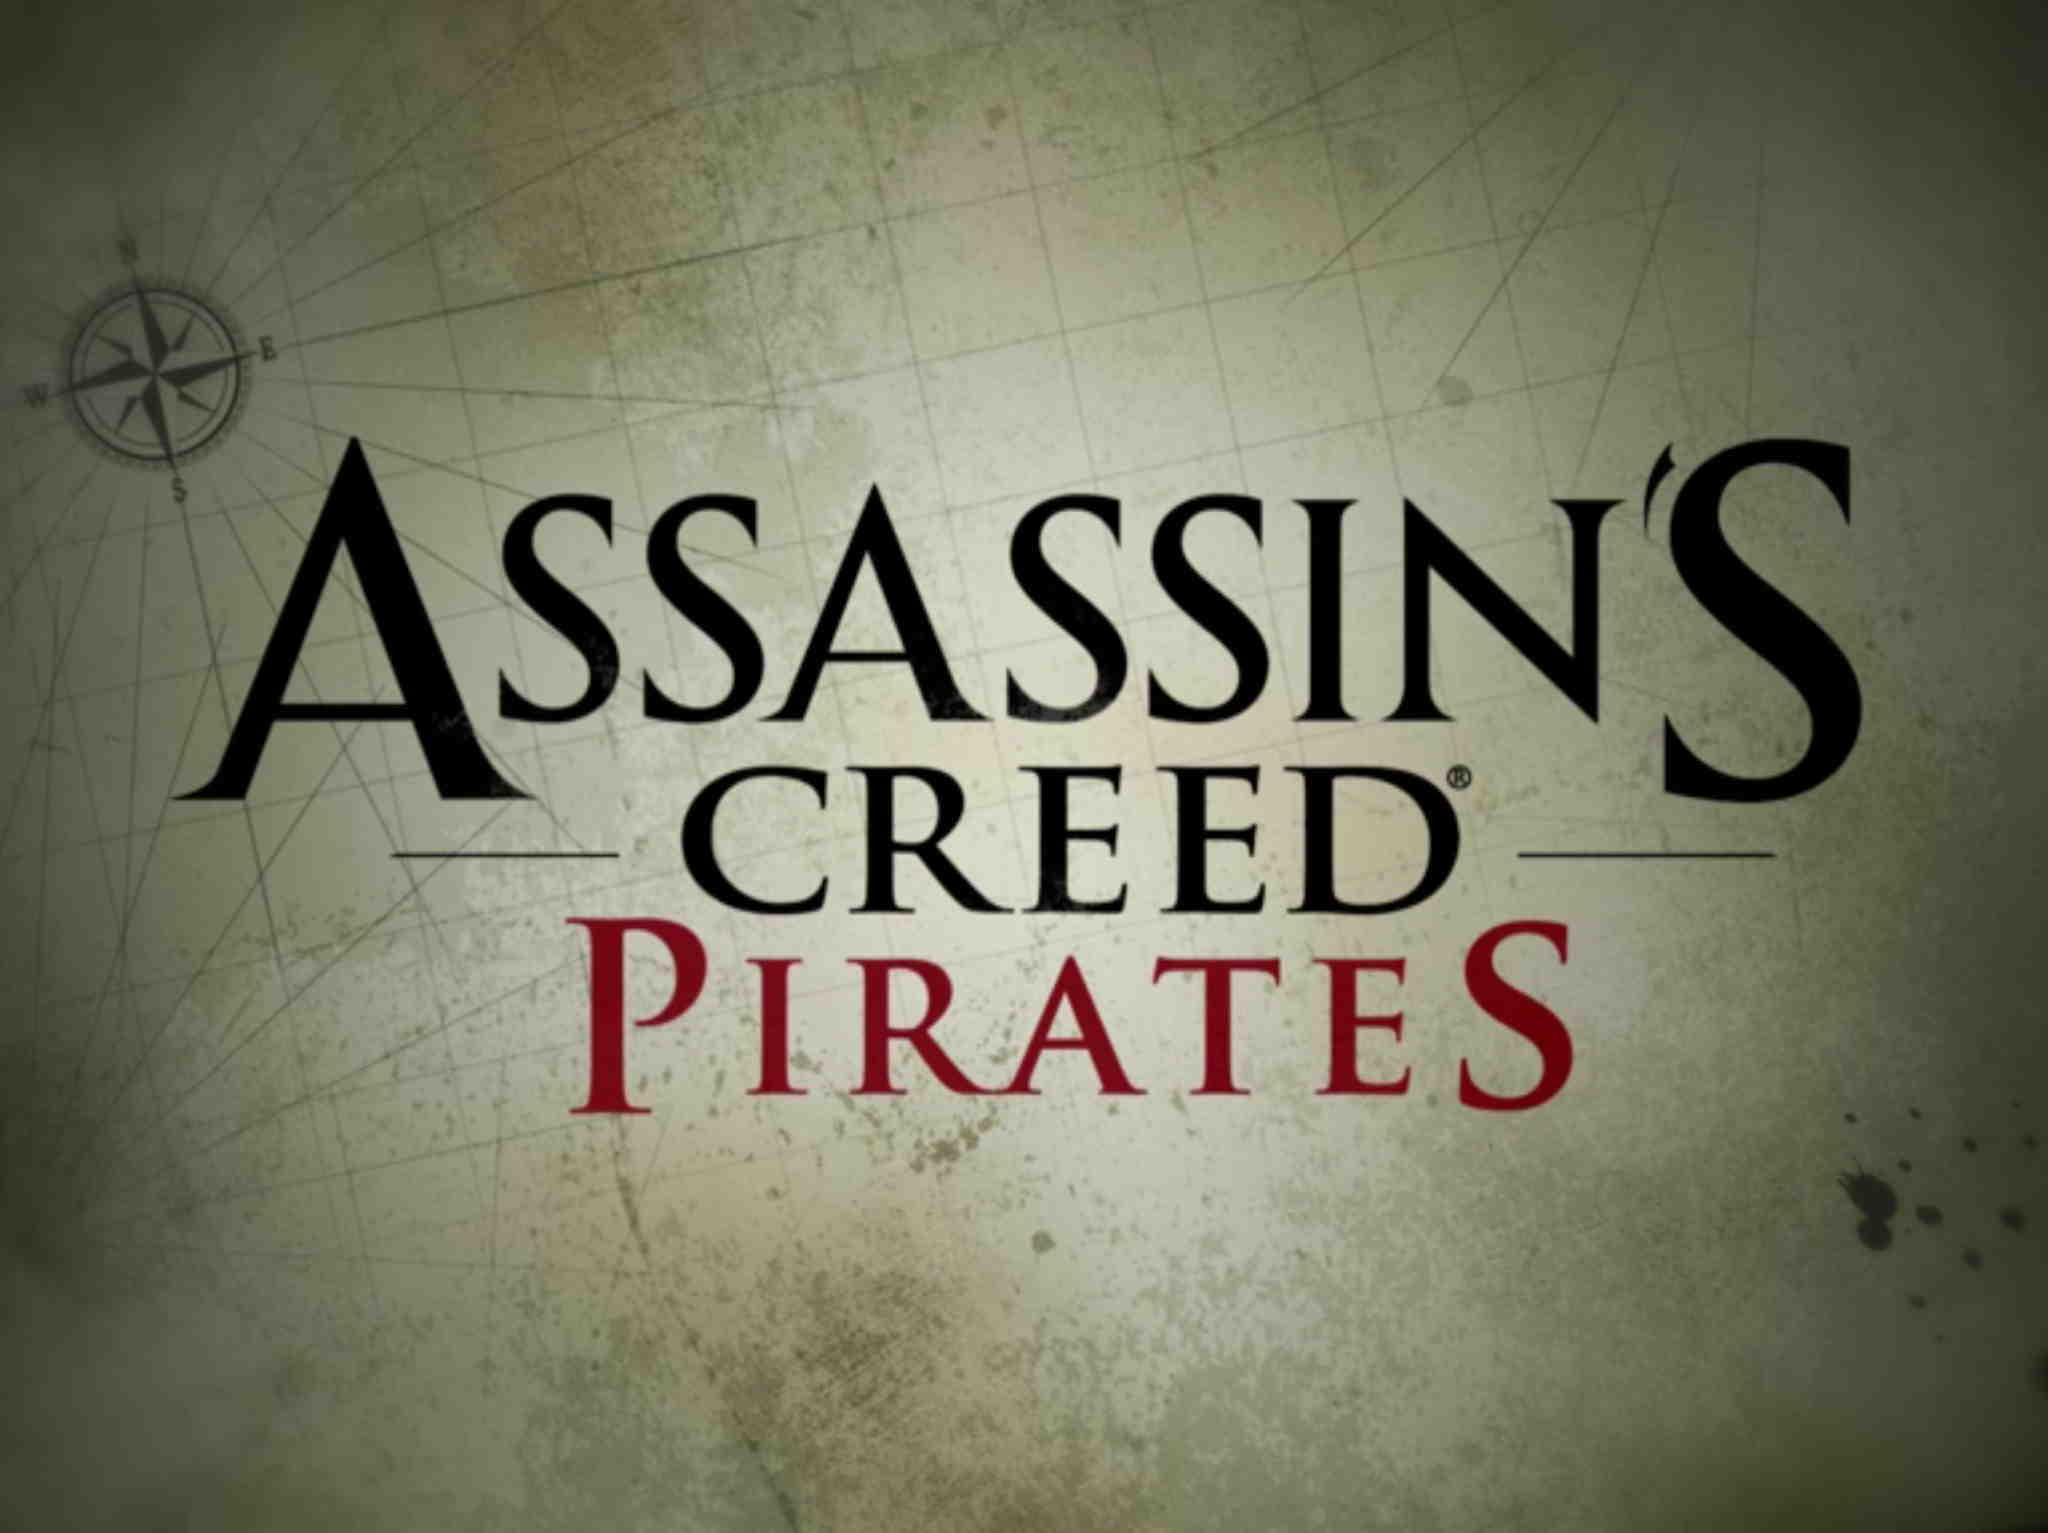 AssassinsCreedPirates_01